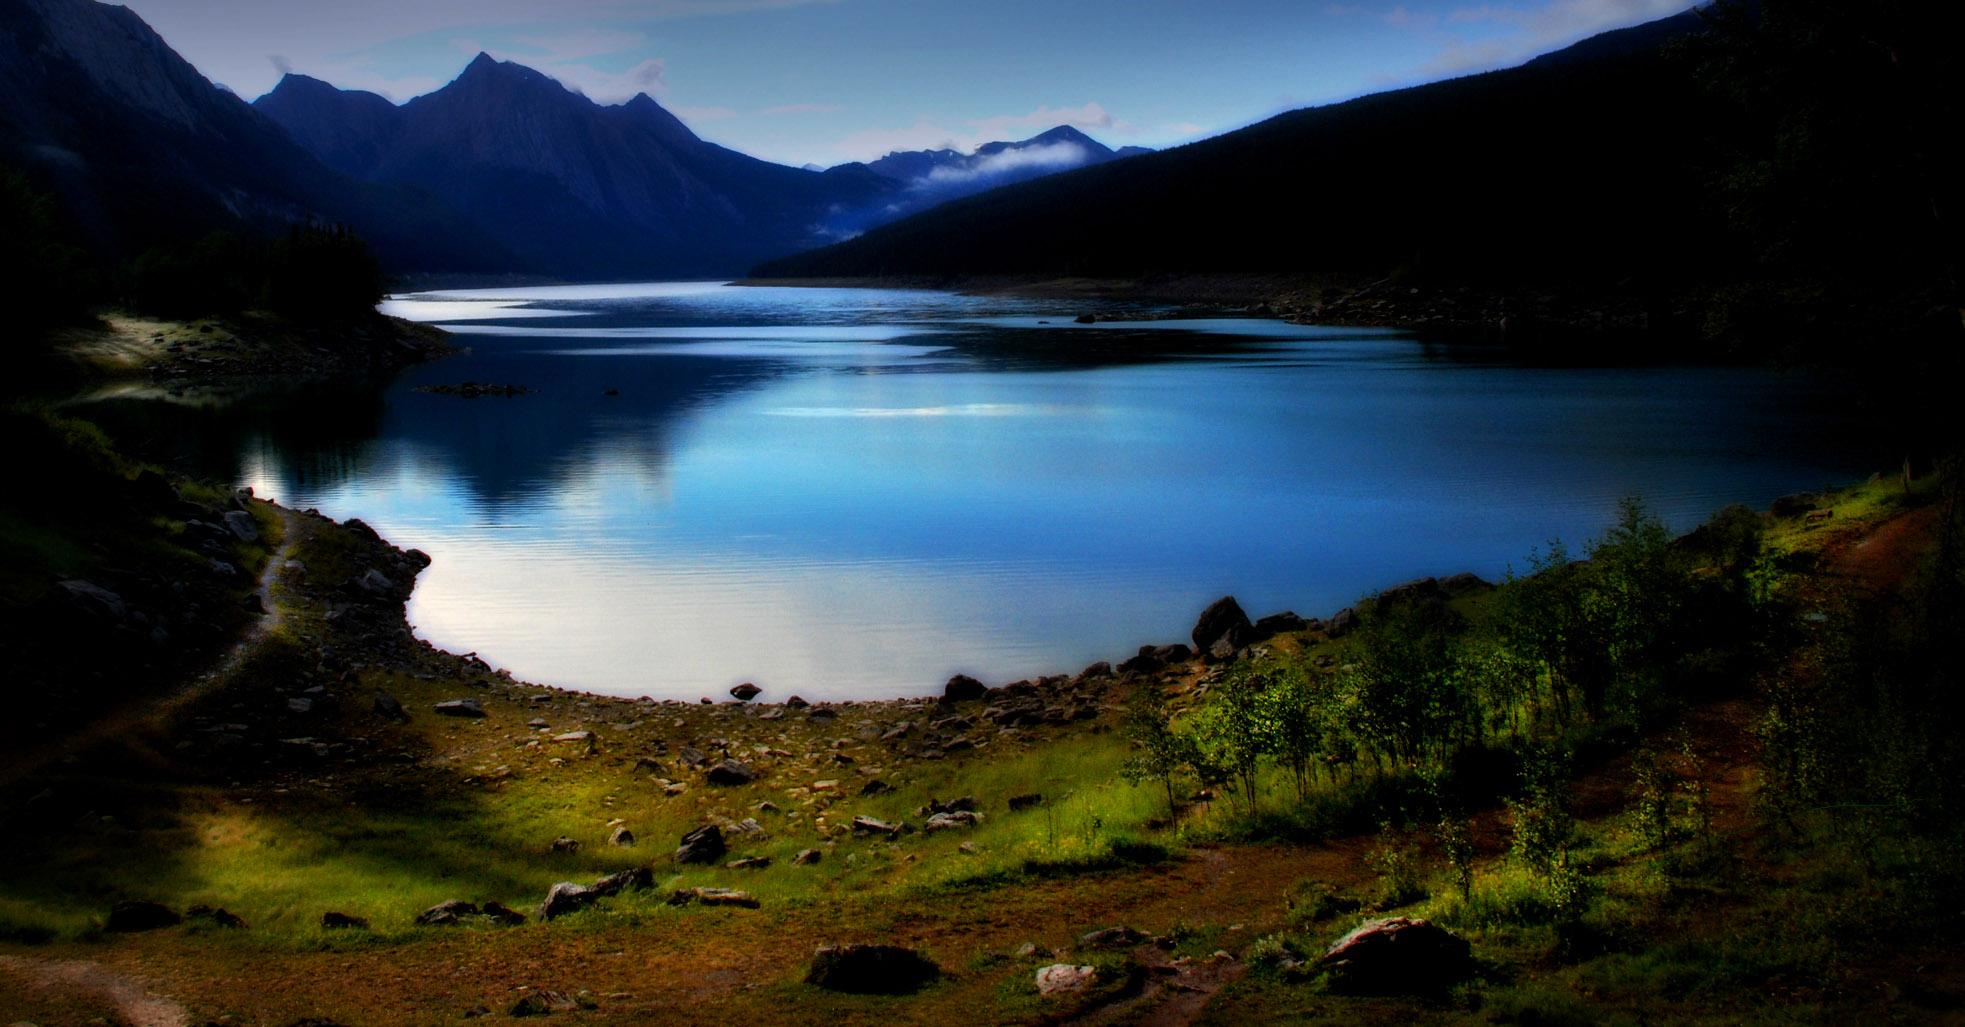 Jasper National Park, Medicine Lake